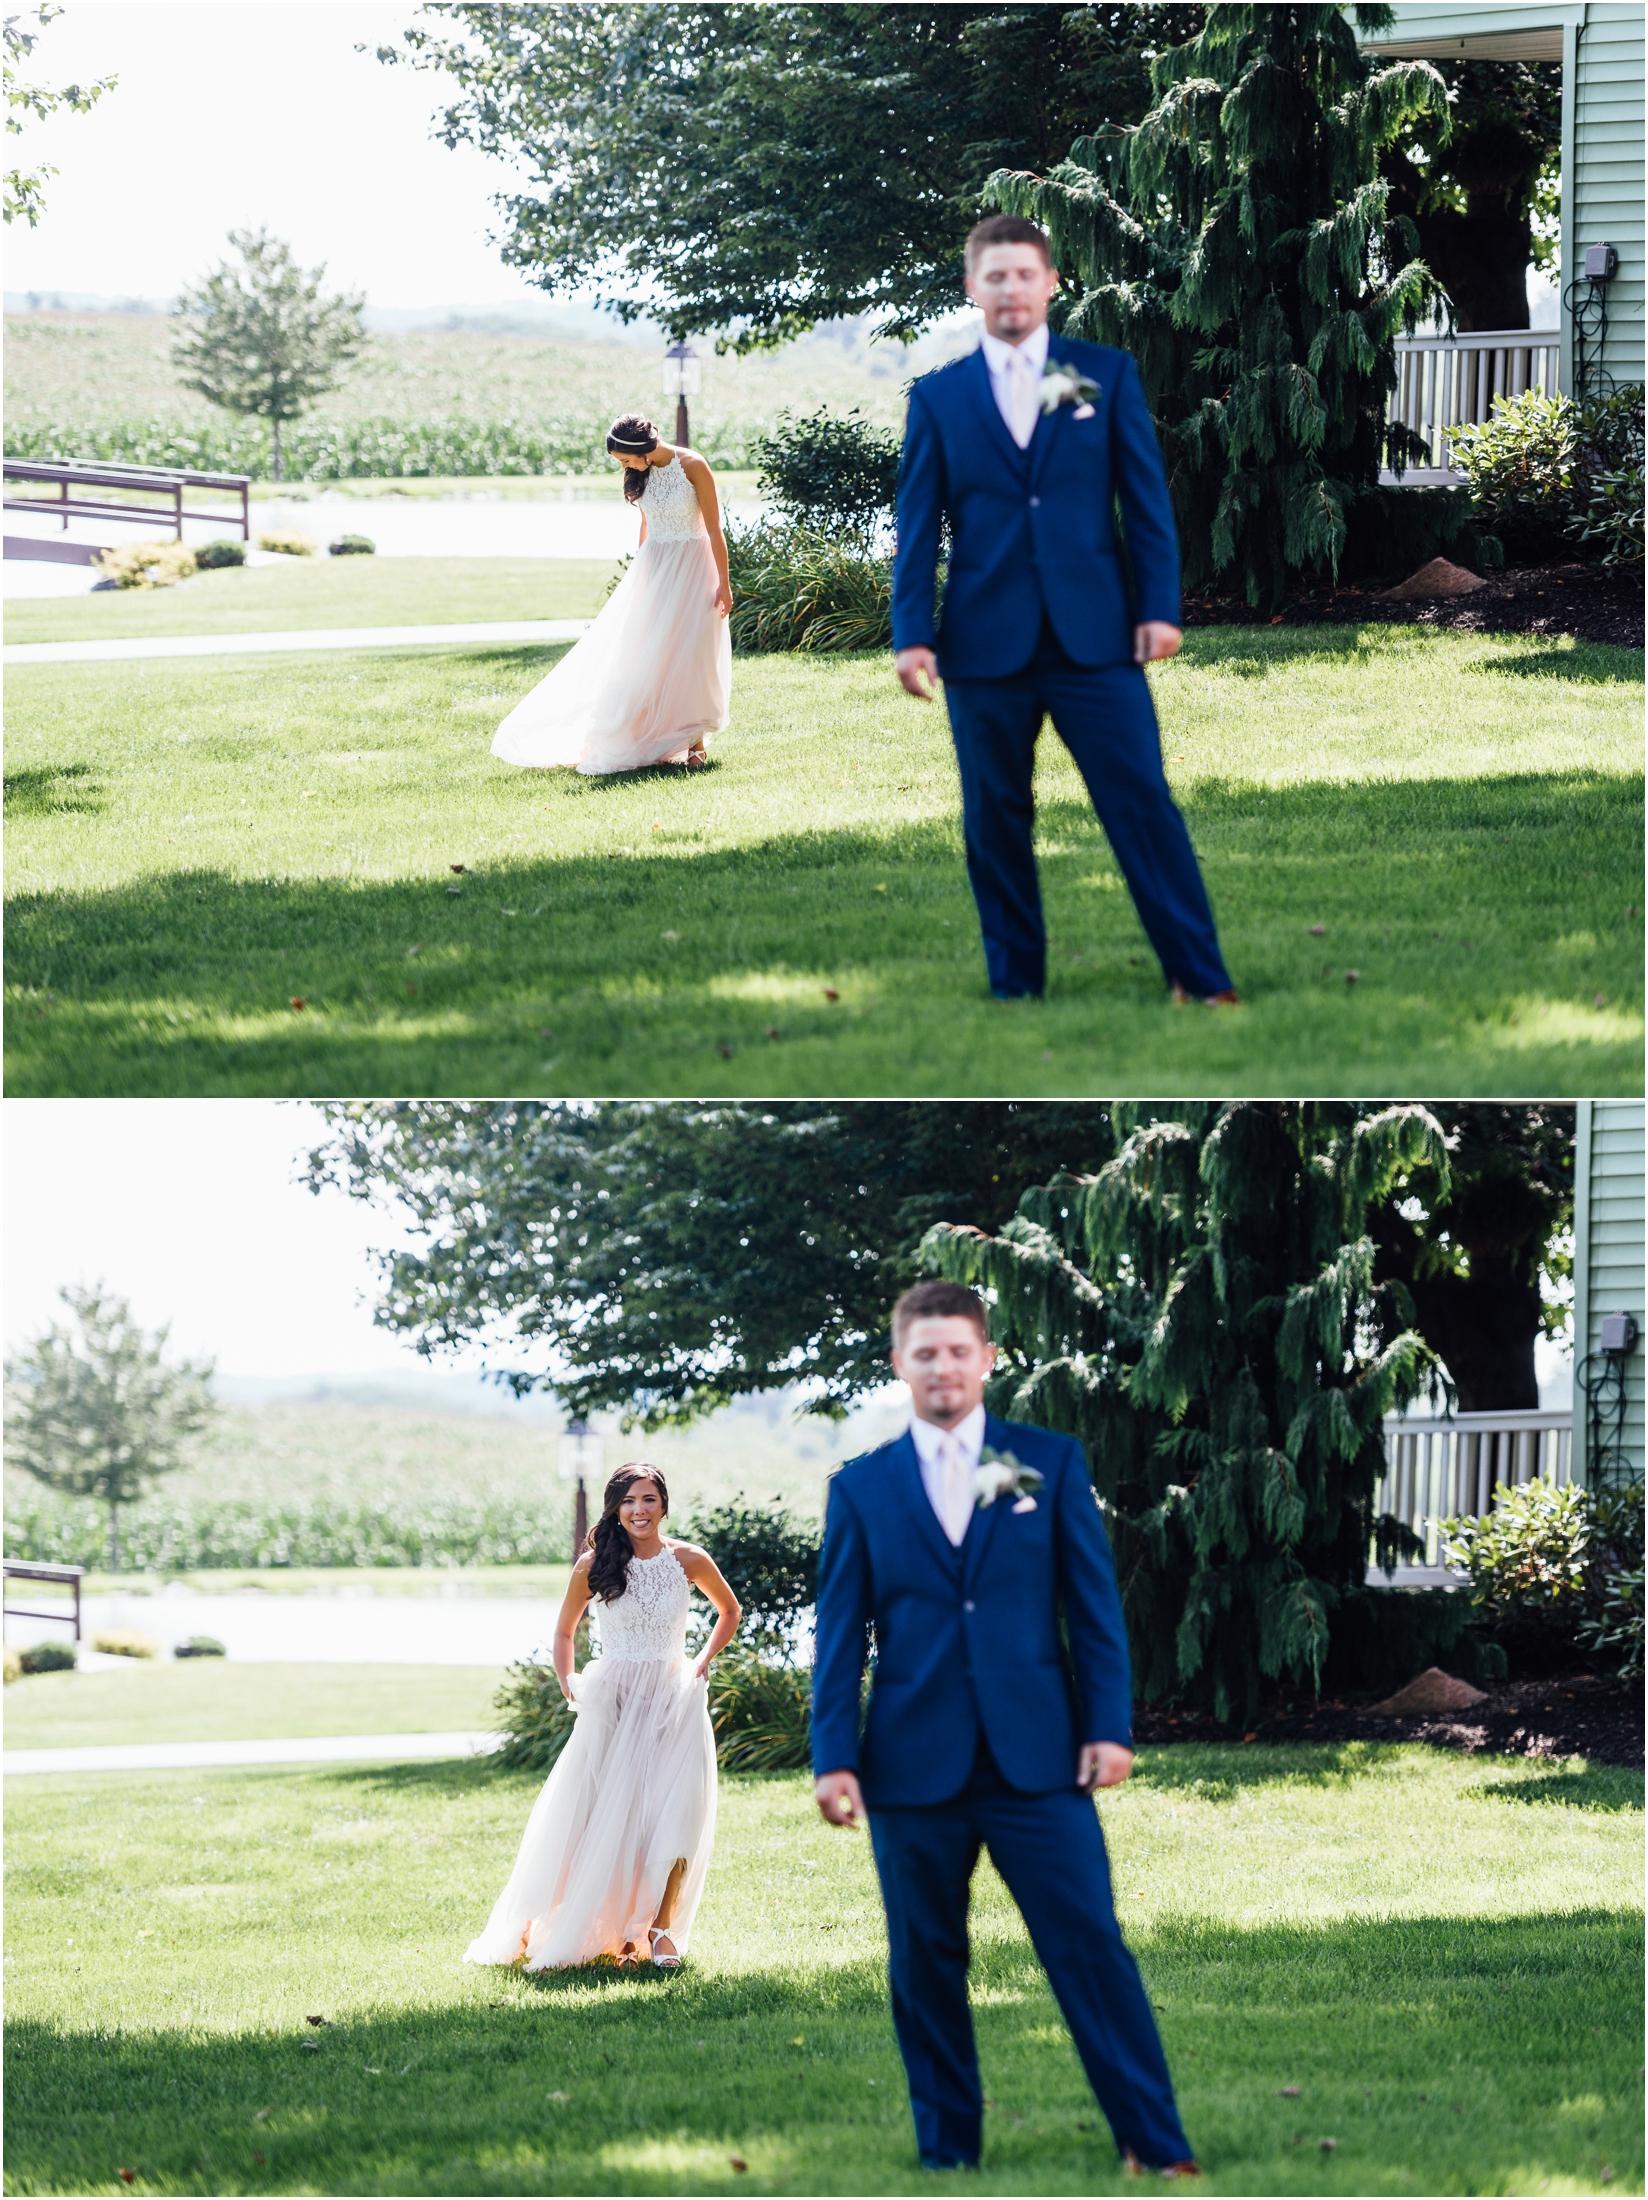 Steph&Bryan_Lancaster_wedding_farm_0501.jpg